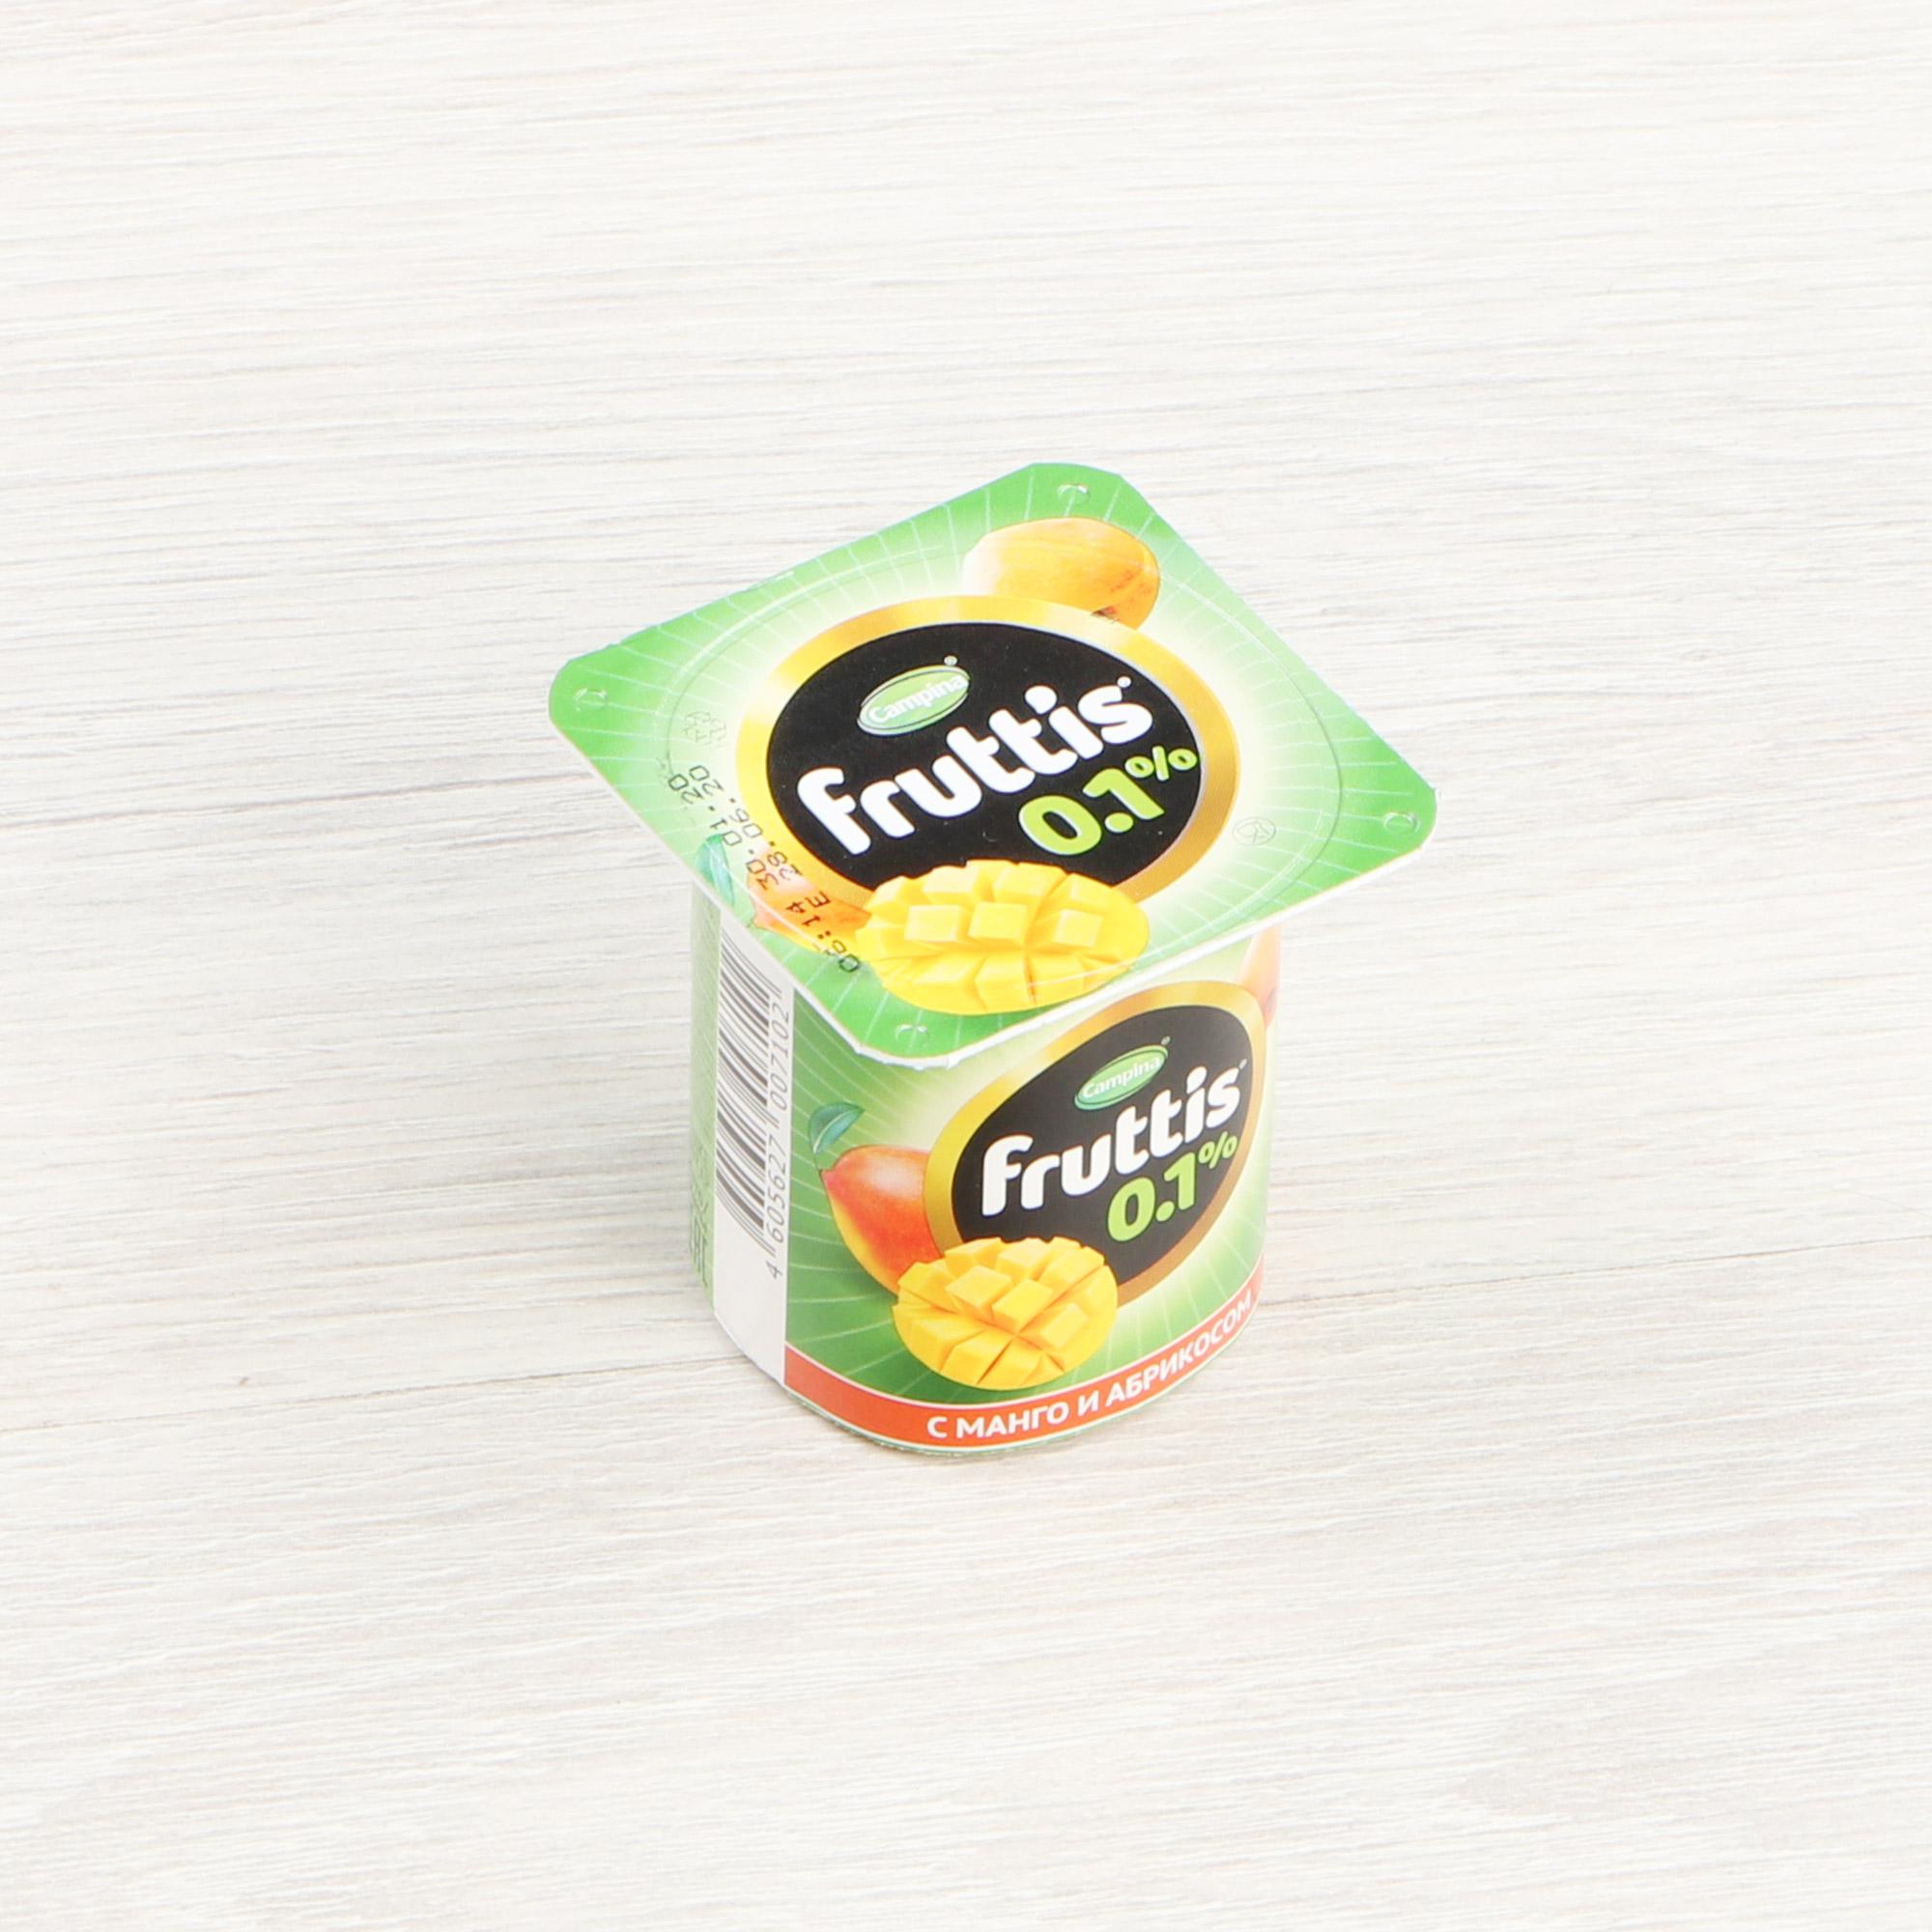 Фото - Йогурт Campina Fruttis Легкий Абрикос, манго, яблоко, груша 0,1% 110 г йогурт campina fruttis легкий клубника 0 1% 110 г